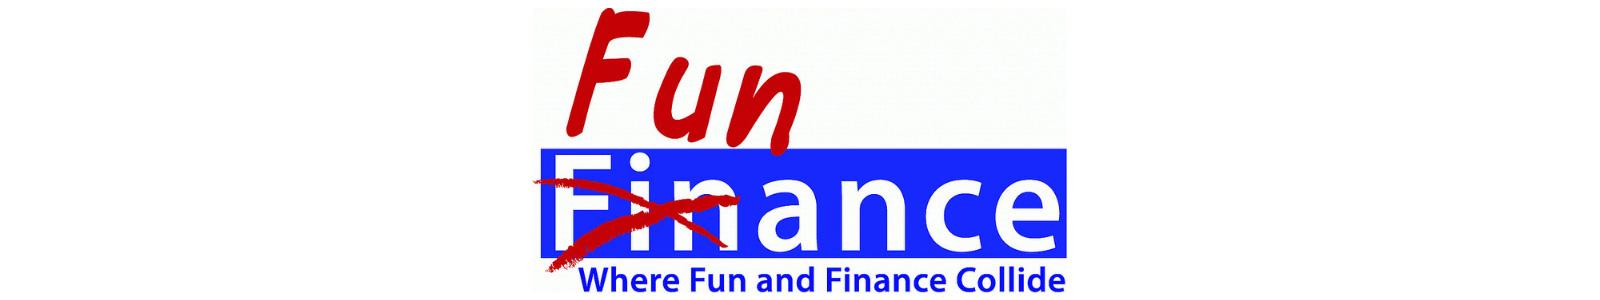 FUNance-Logo-Mlg.jpg